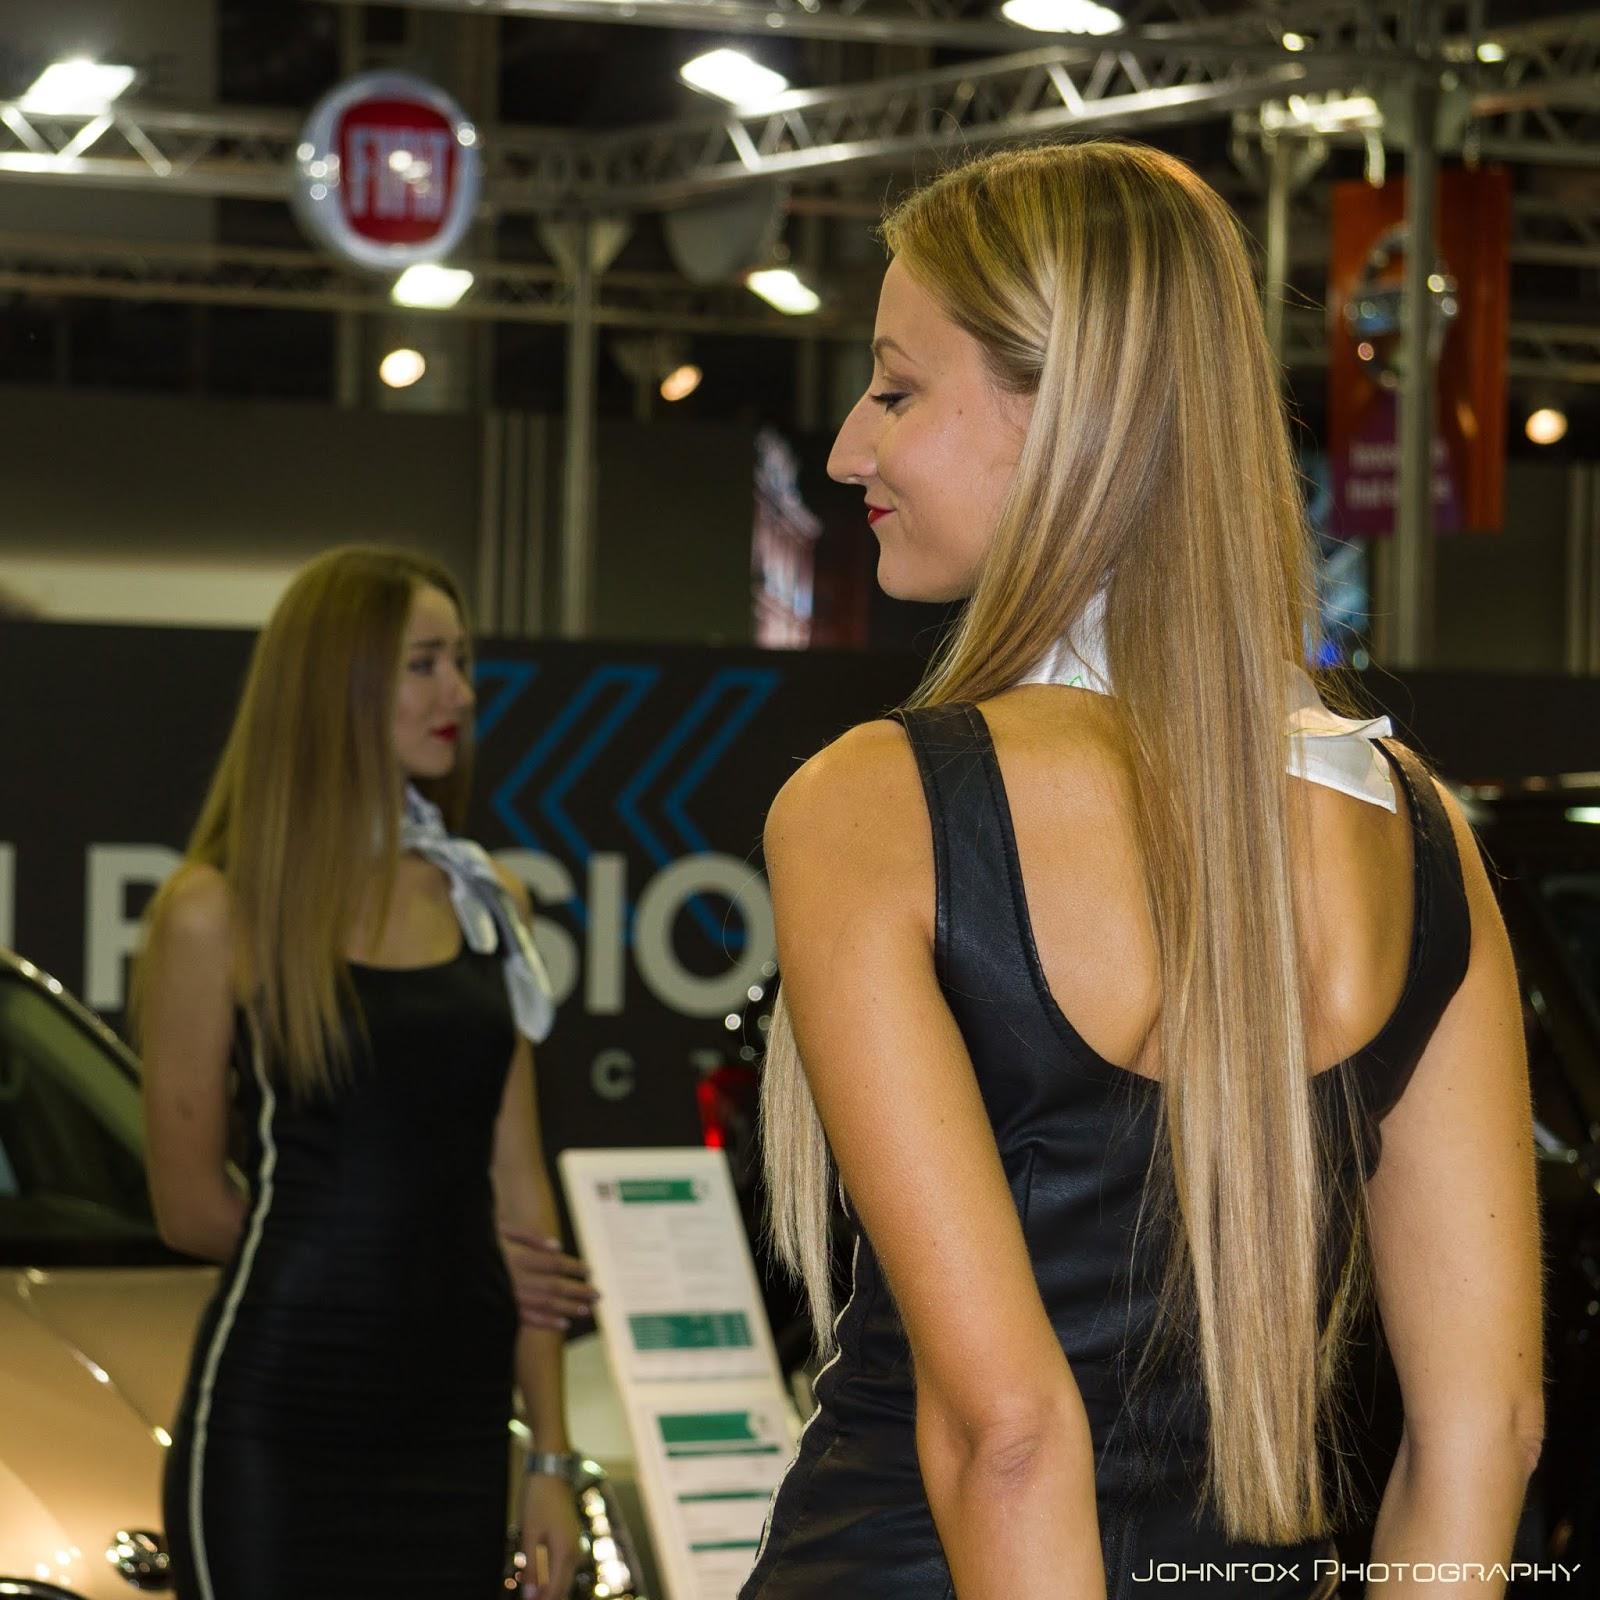 models2B2528172Bof2B232529 Τα κορίτσια της Αυτοκίνησης! Έκθεση, μοντέλα, ΦΩΤΟ, φωτογραφίες